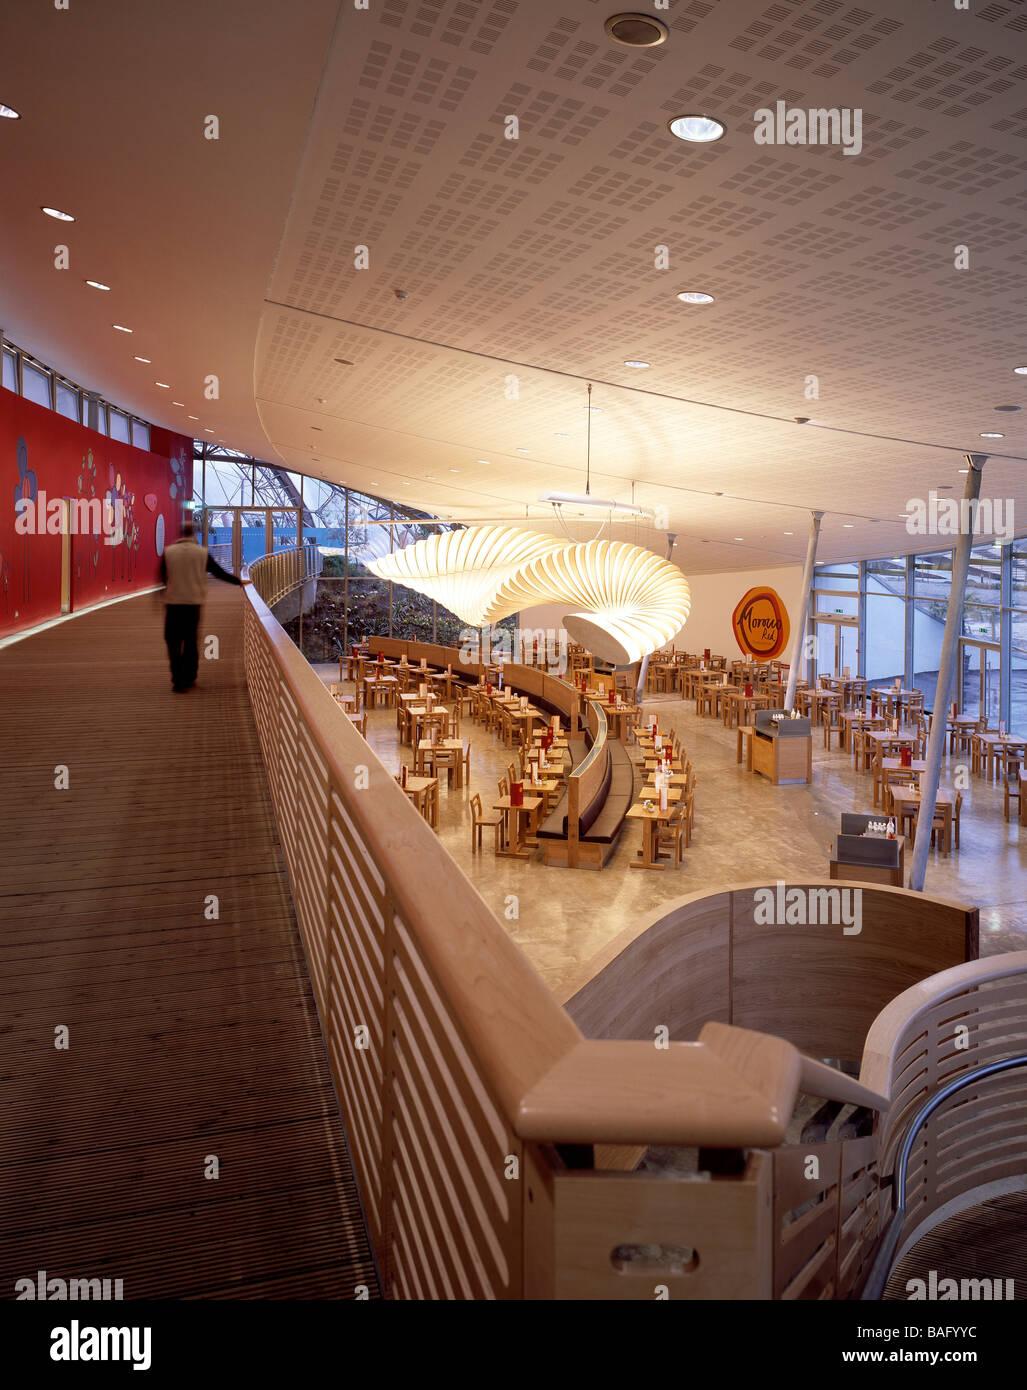 eden project portrait view of biome link building/cafe Stock Photo ...